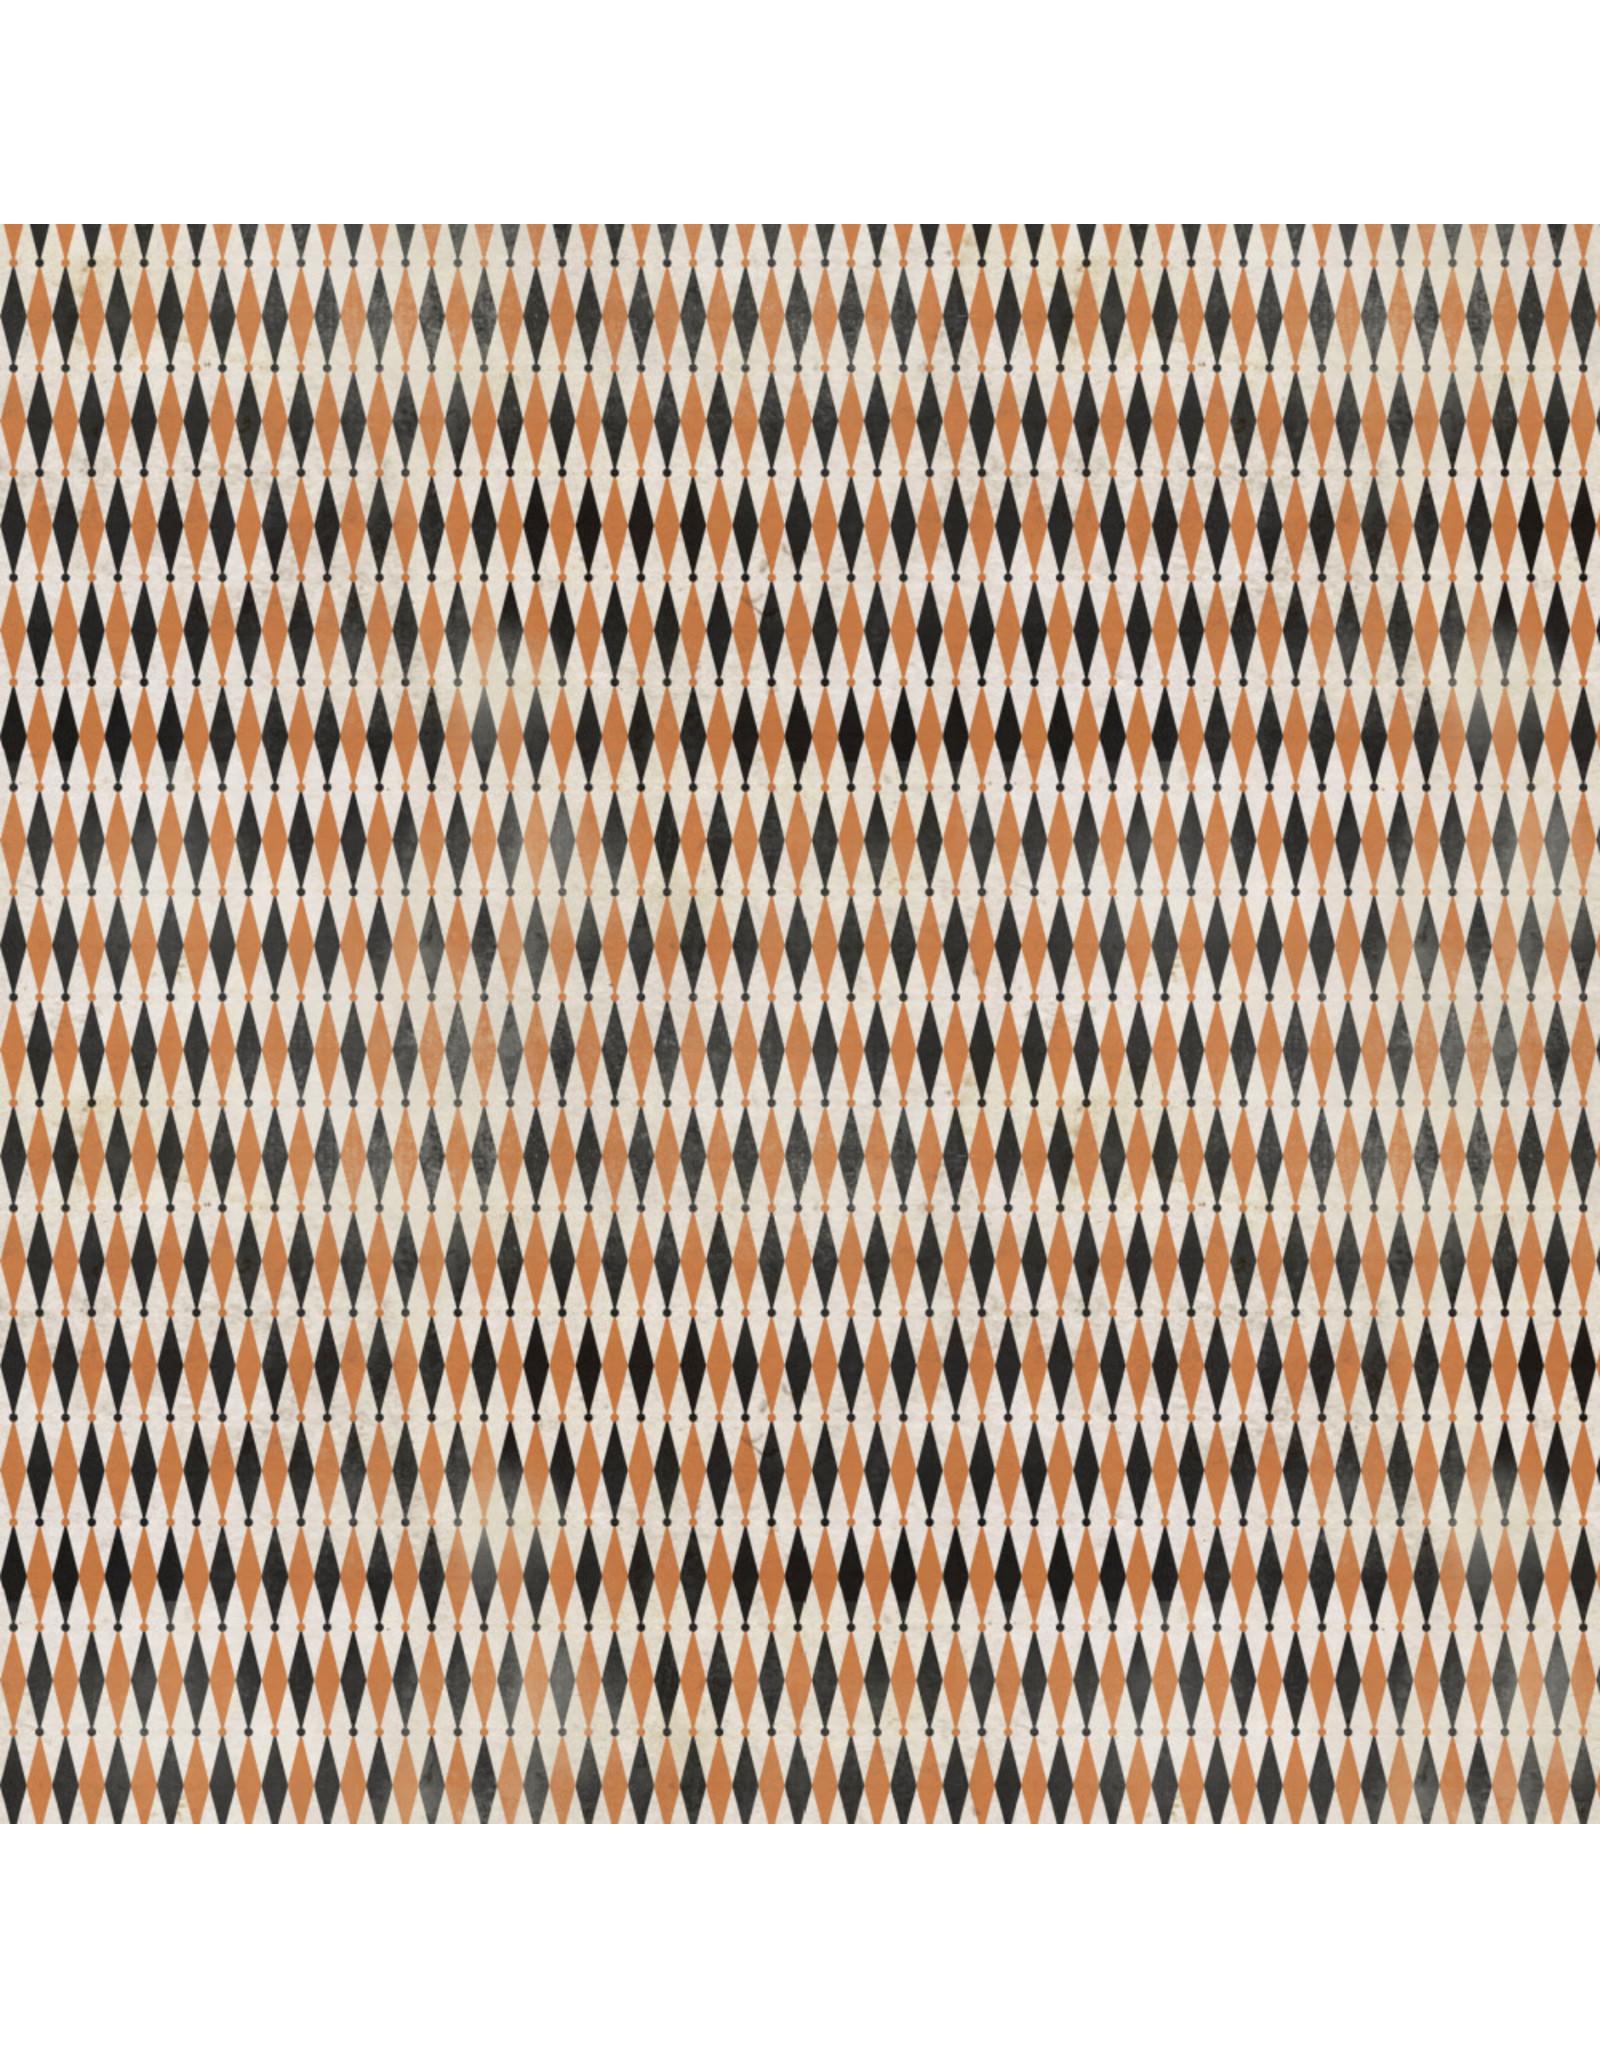 Tim Holtz Regions Beyond, Peculiar in Multi, Fabric Half-Yards